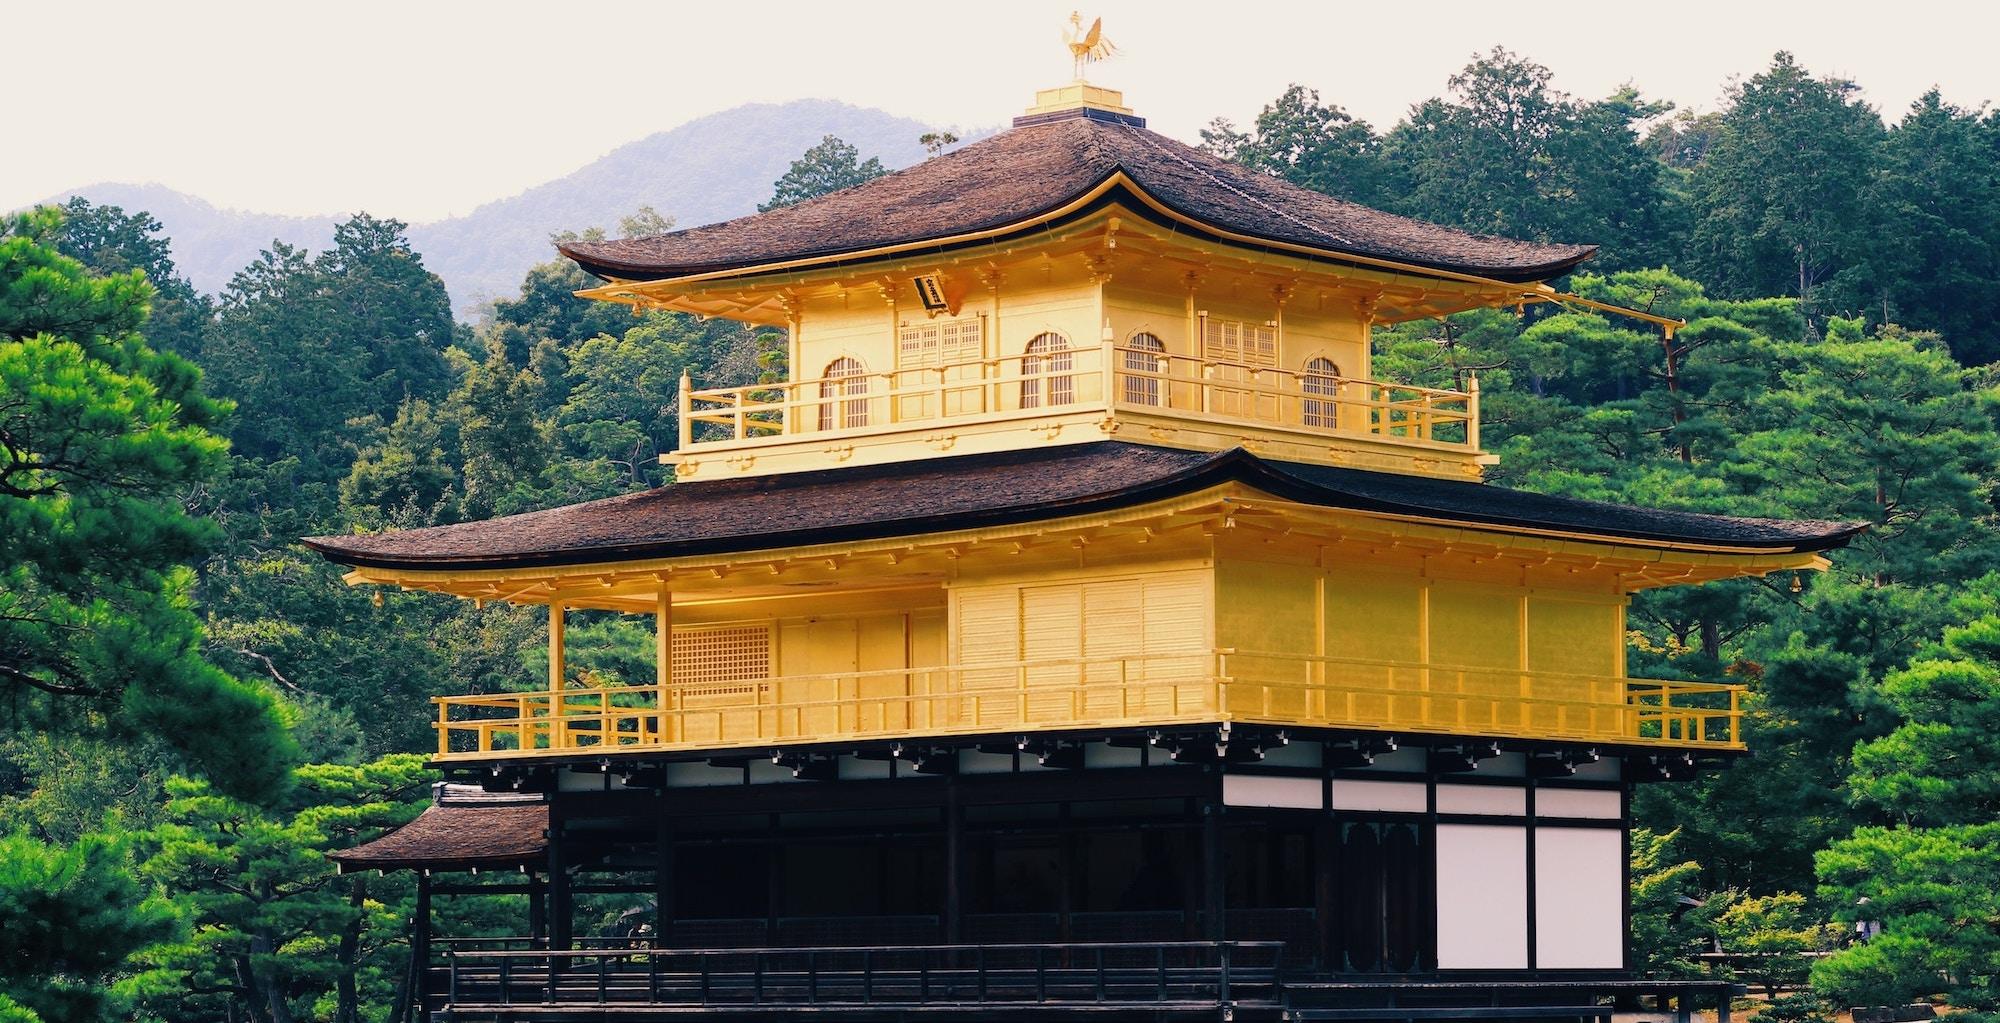 Discover Kinkakuji Temple, Kyoto's Golden Pavilion